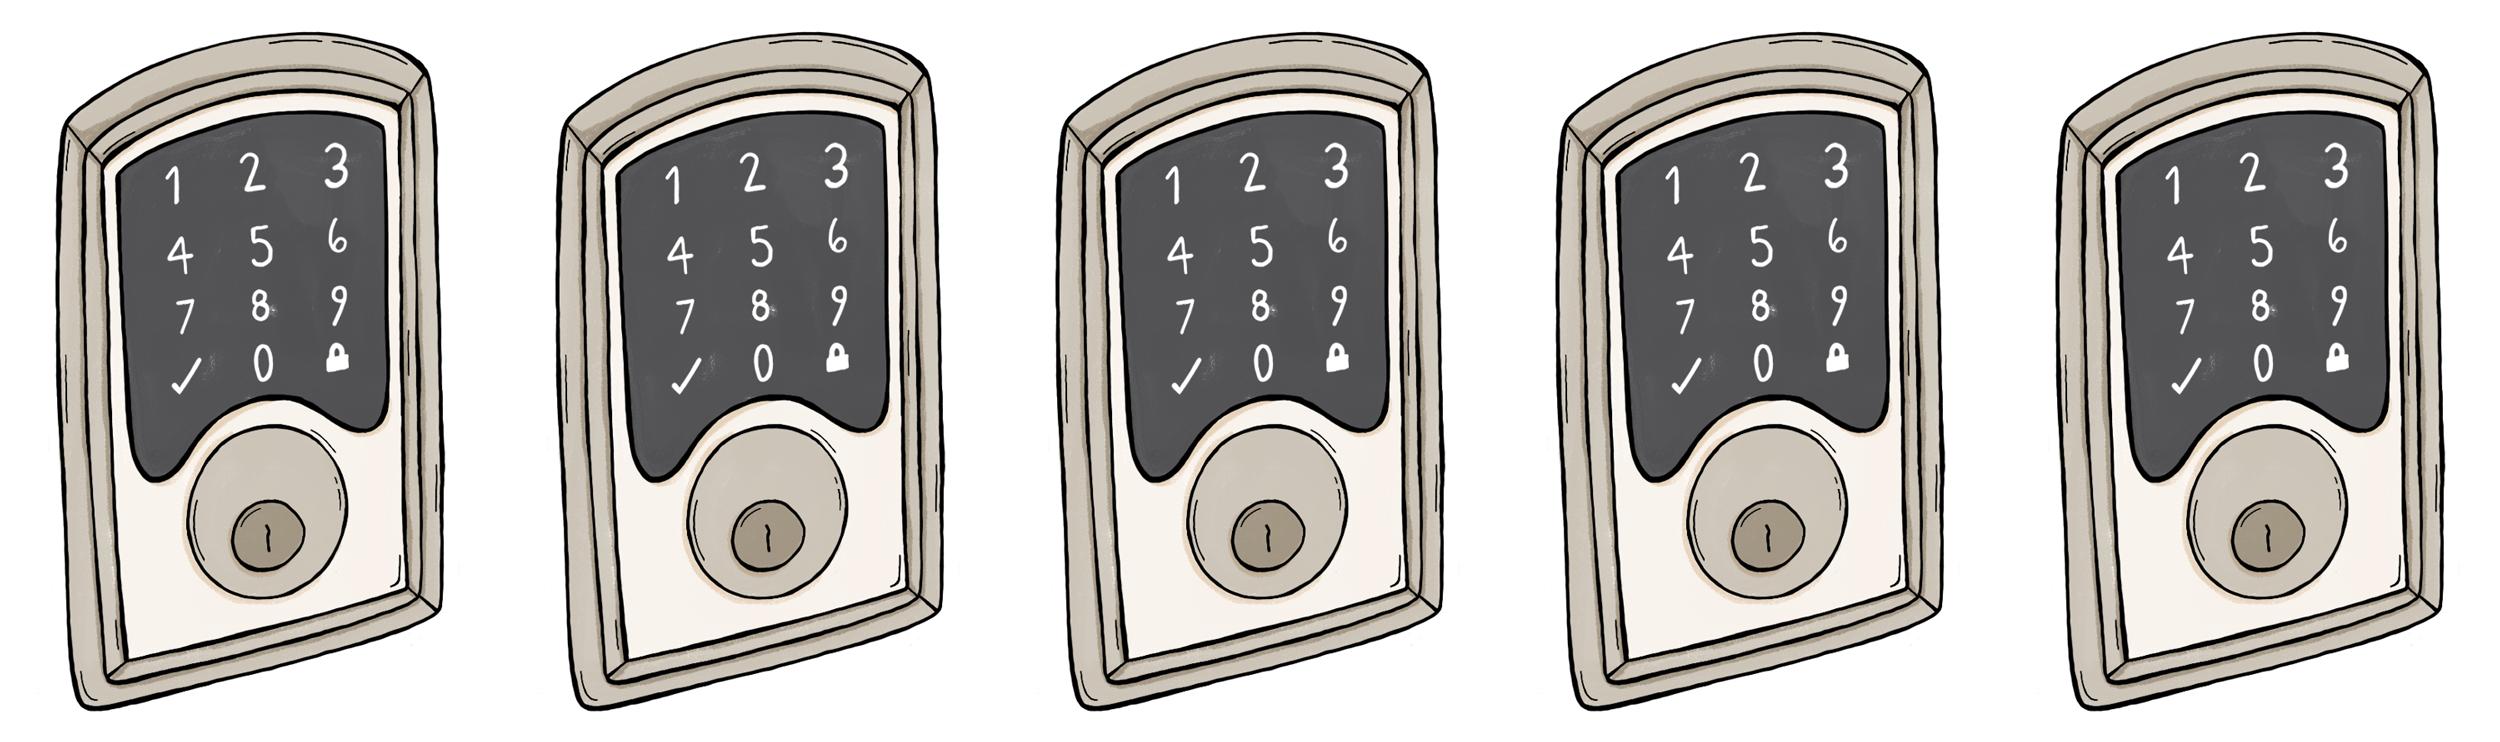 Smart locks 101 pros and cons to know curbed illustrated keypad locks rubansaba